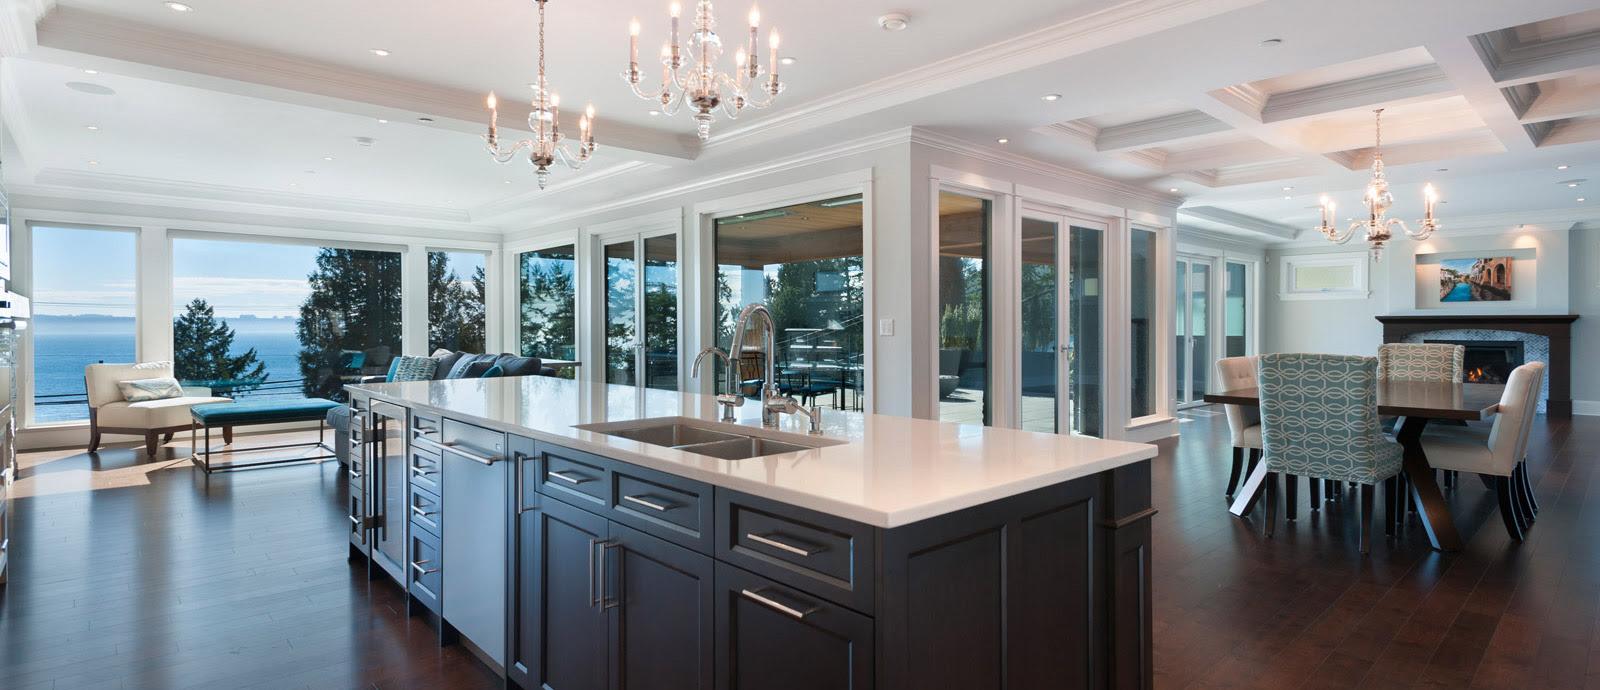 Interior Designer   Vancouver Home Design - Sarah Gallop ...